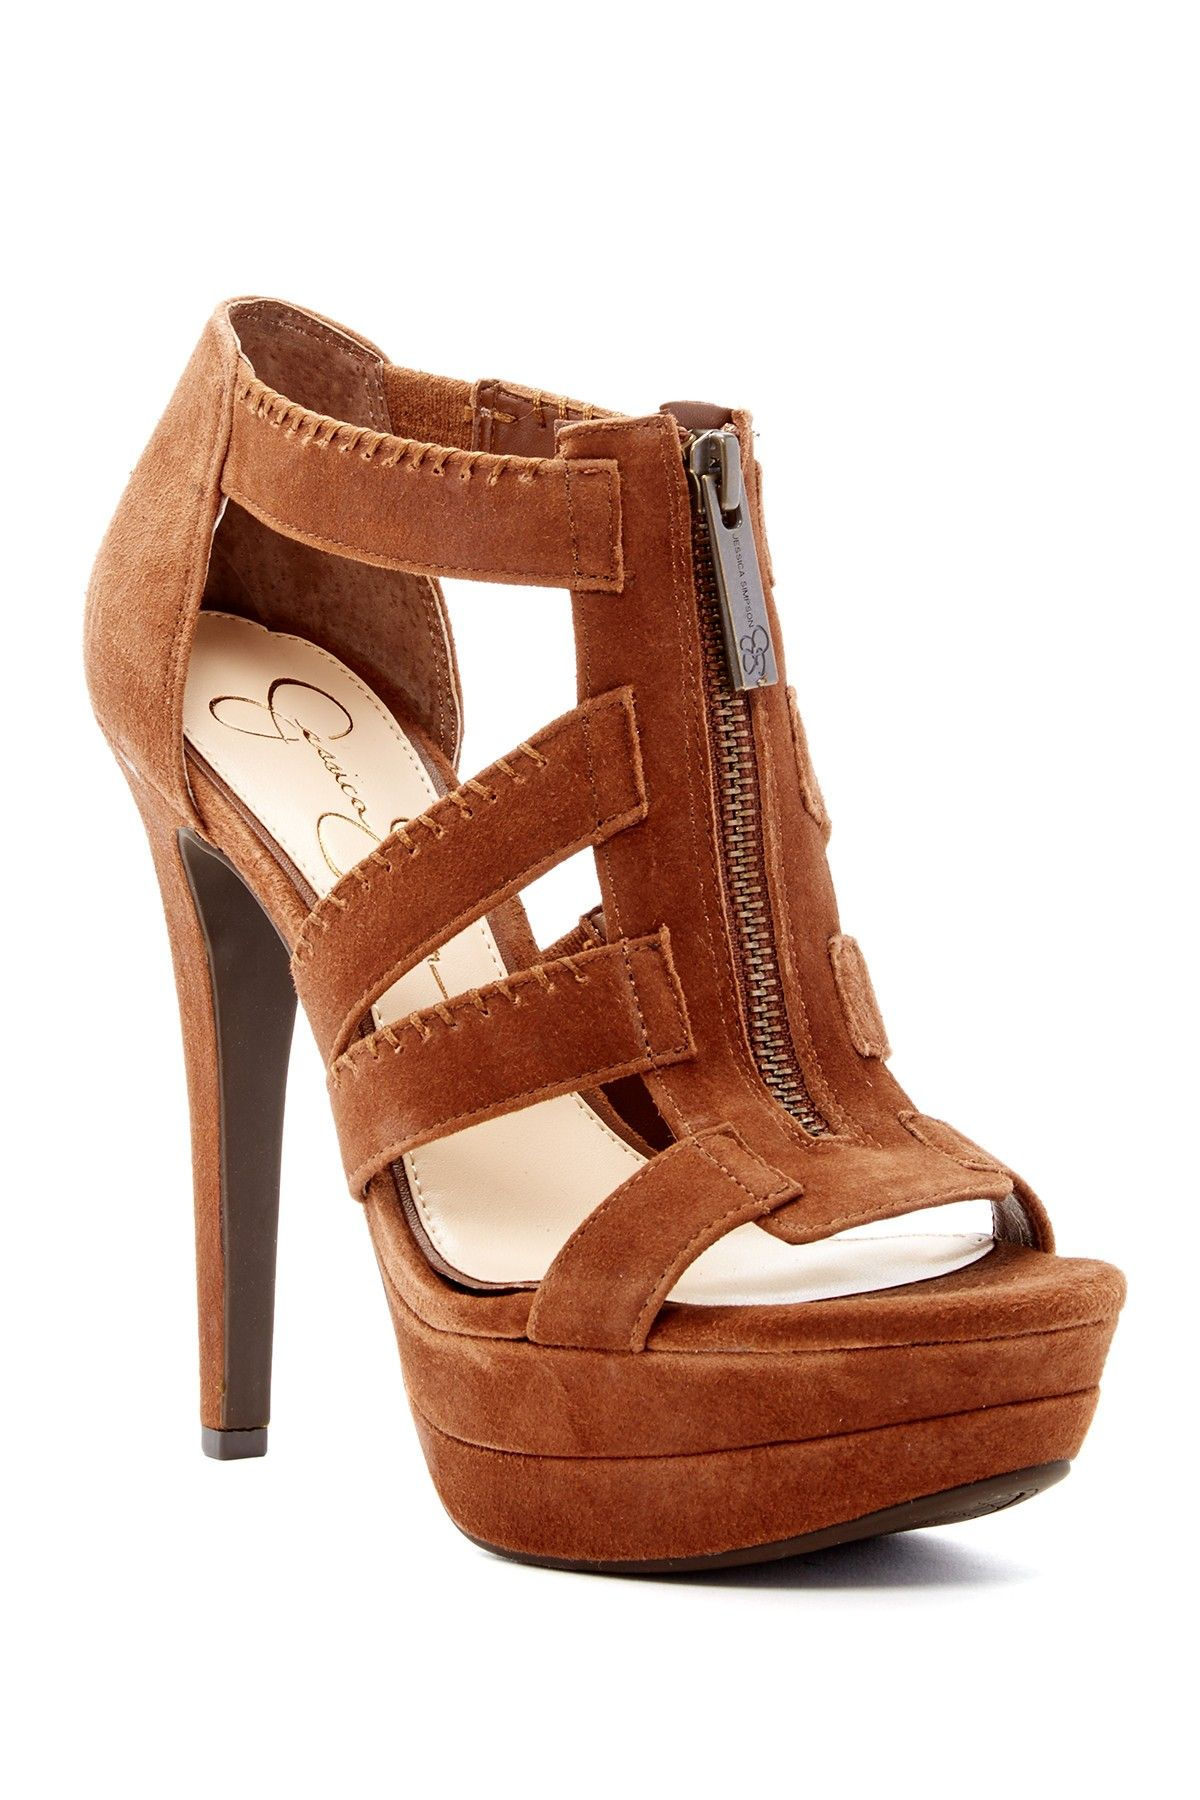 1abd0e7e2b Jessica Simpson   Saylor High Heel Sandal   Shoes & Bags   Shoes ...